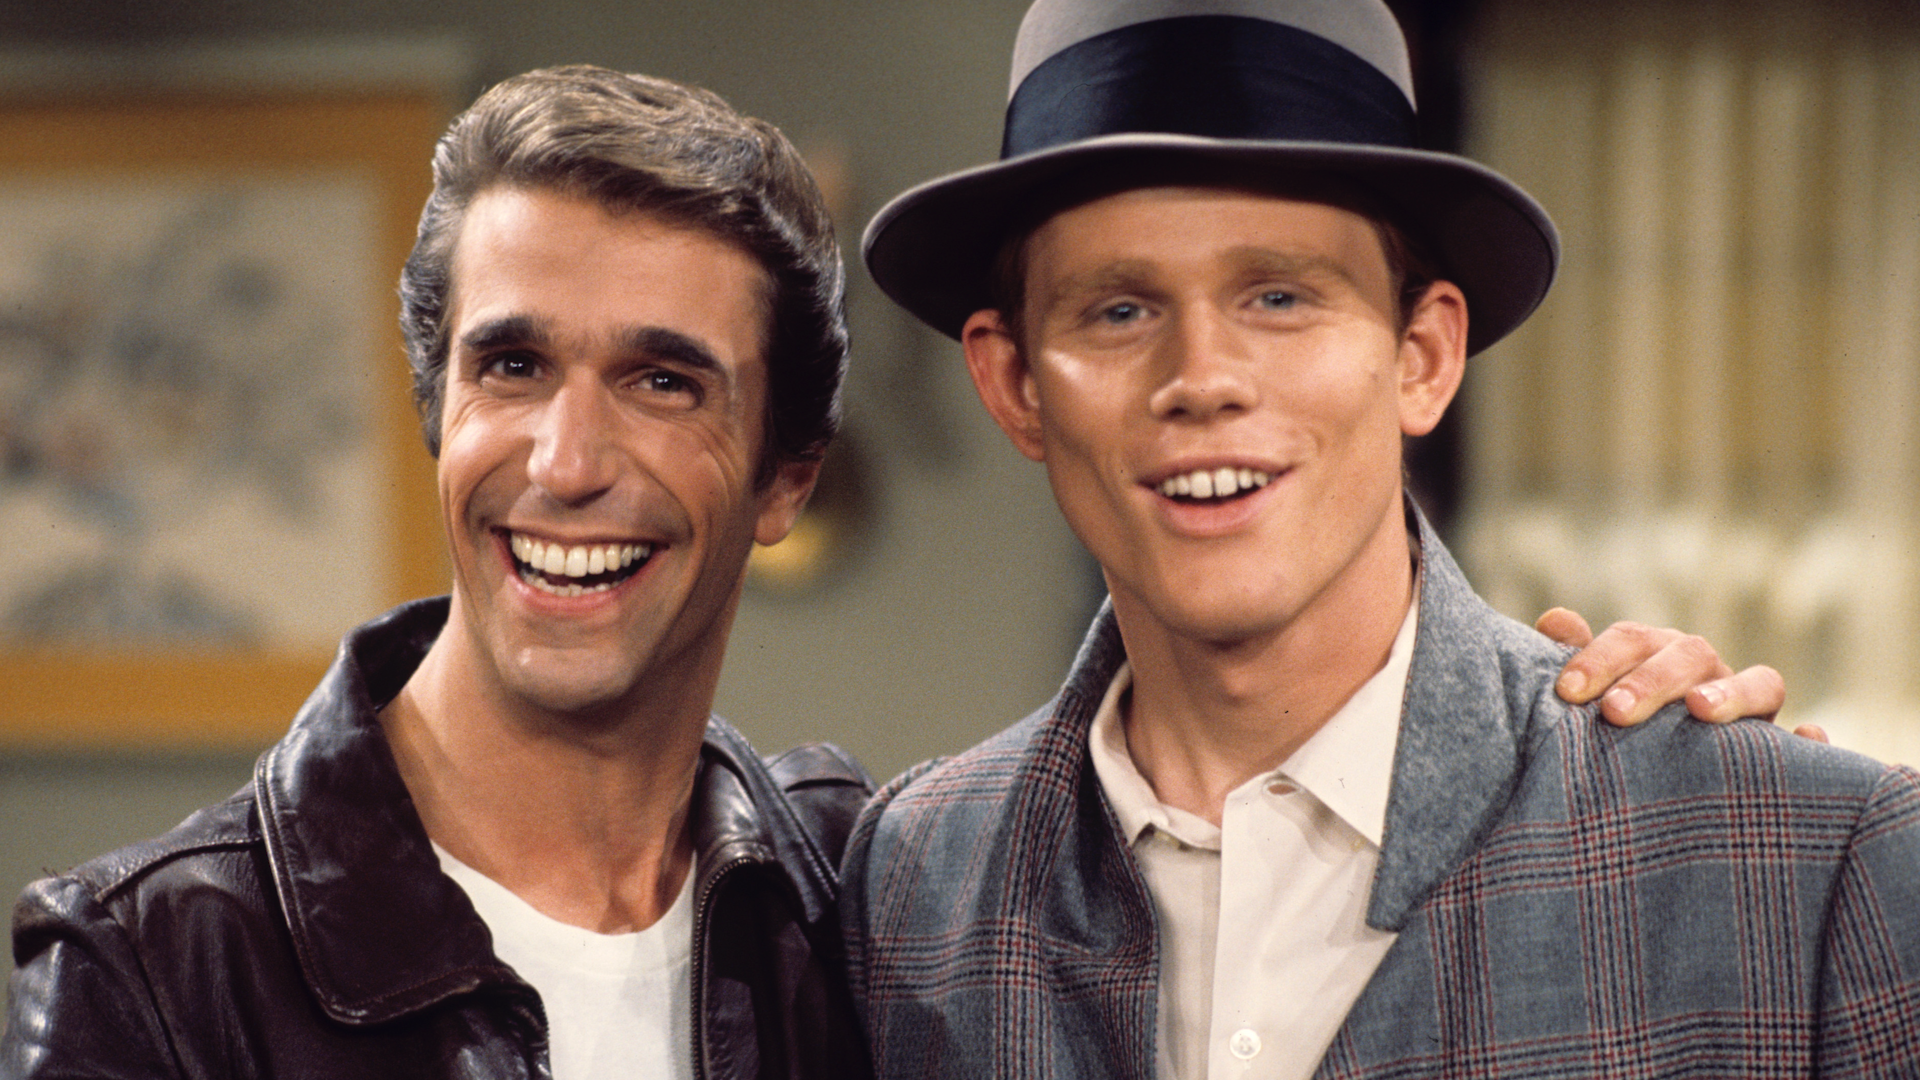 Henry Winkler reveals Ron Howard's 'feelings were hurt' by success of Fonzie character